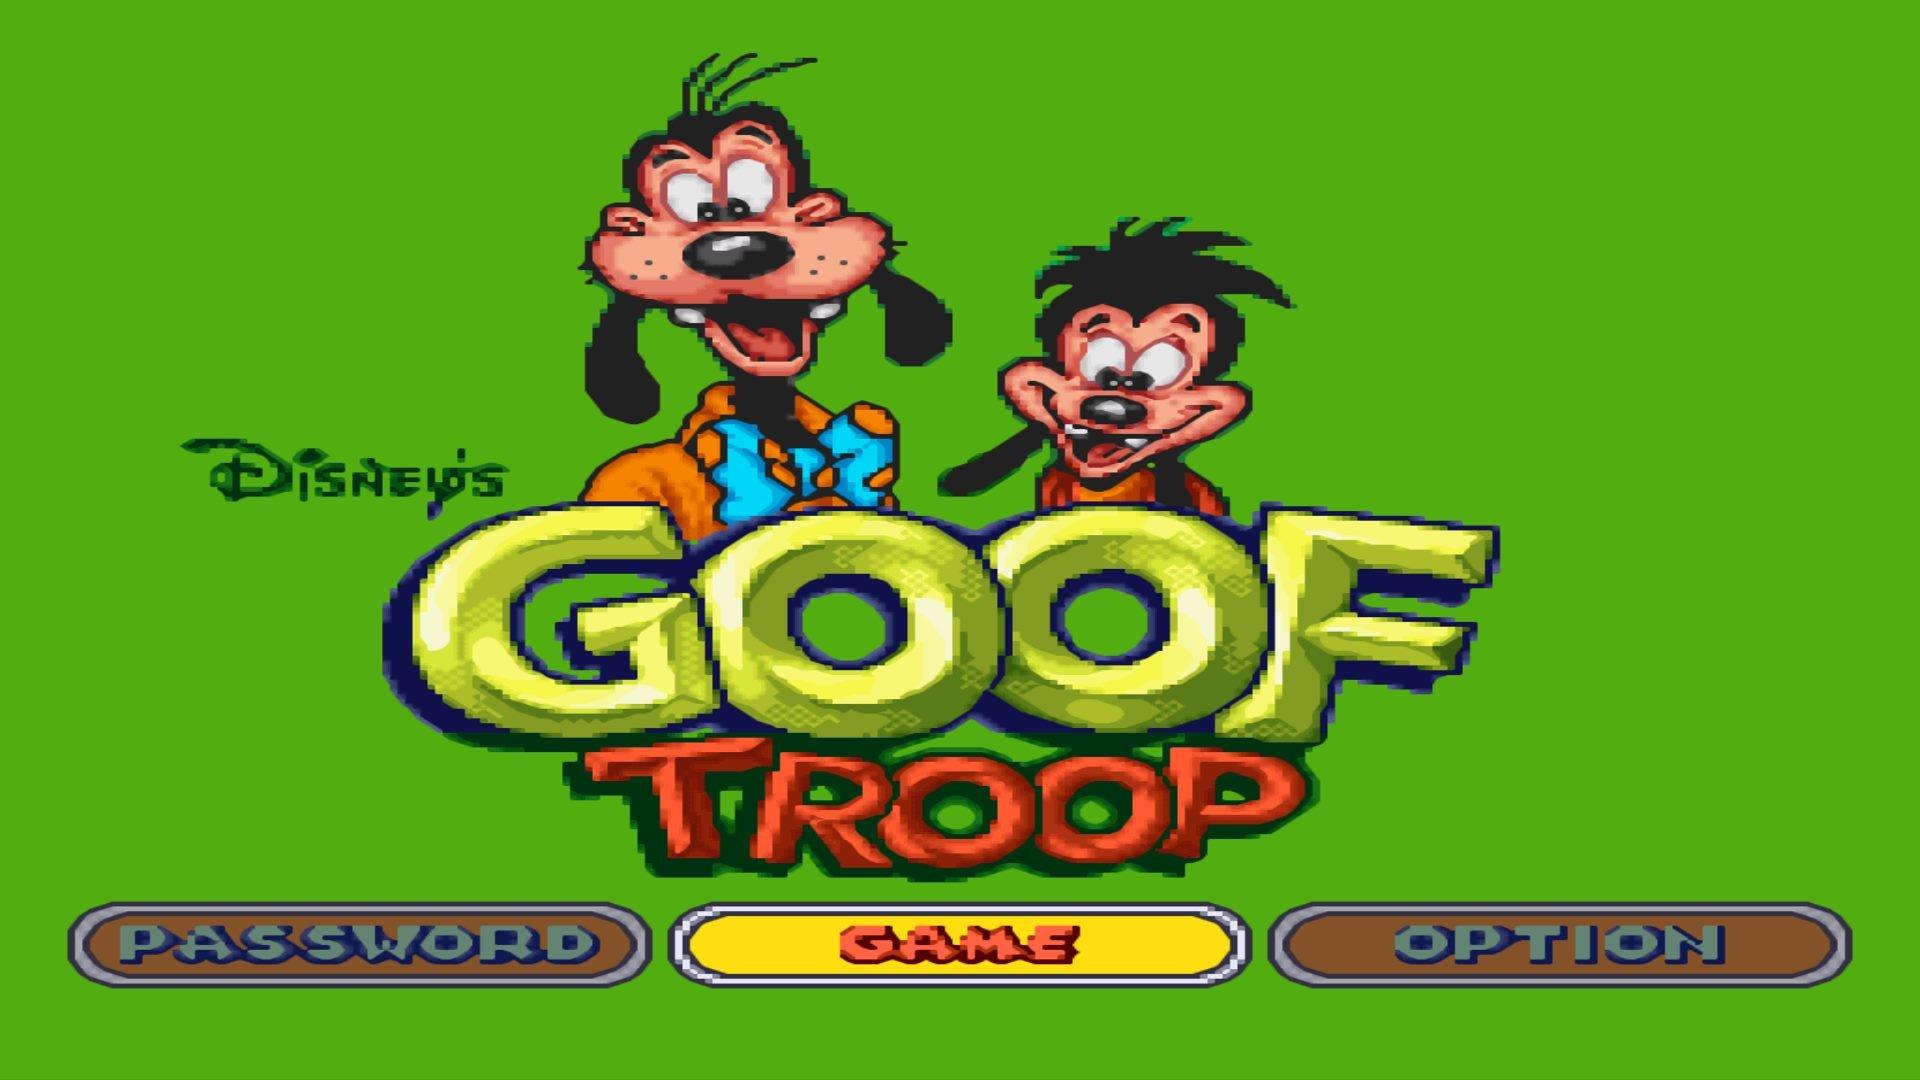 … Goof Troop SNES Wallpaper …